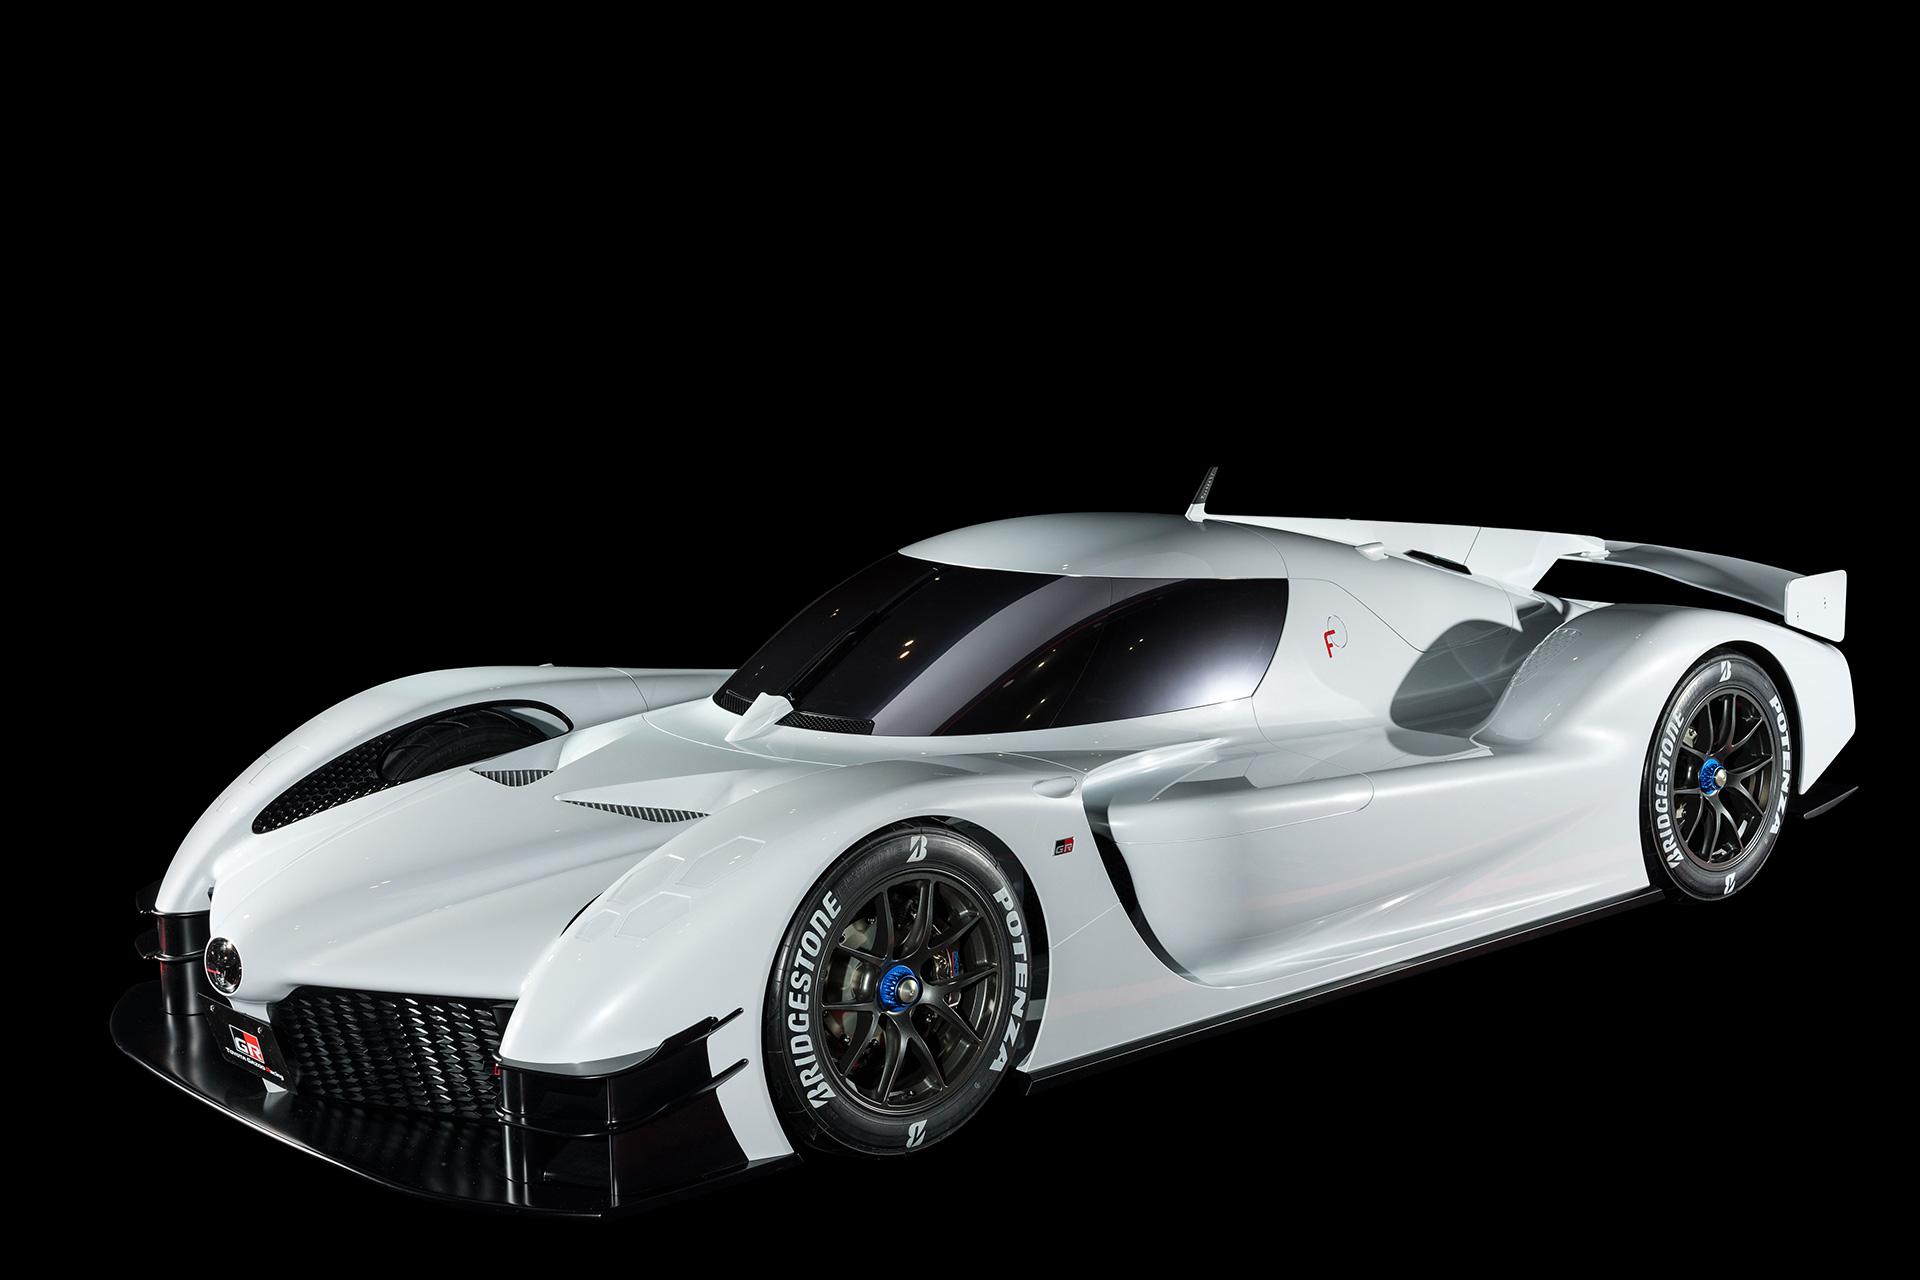 Toyota's GR Super Sport hypercar nears production thumbnail